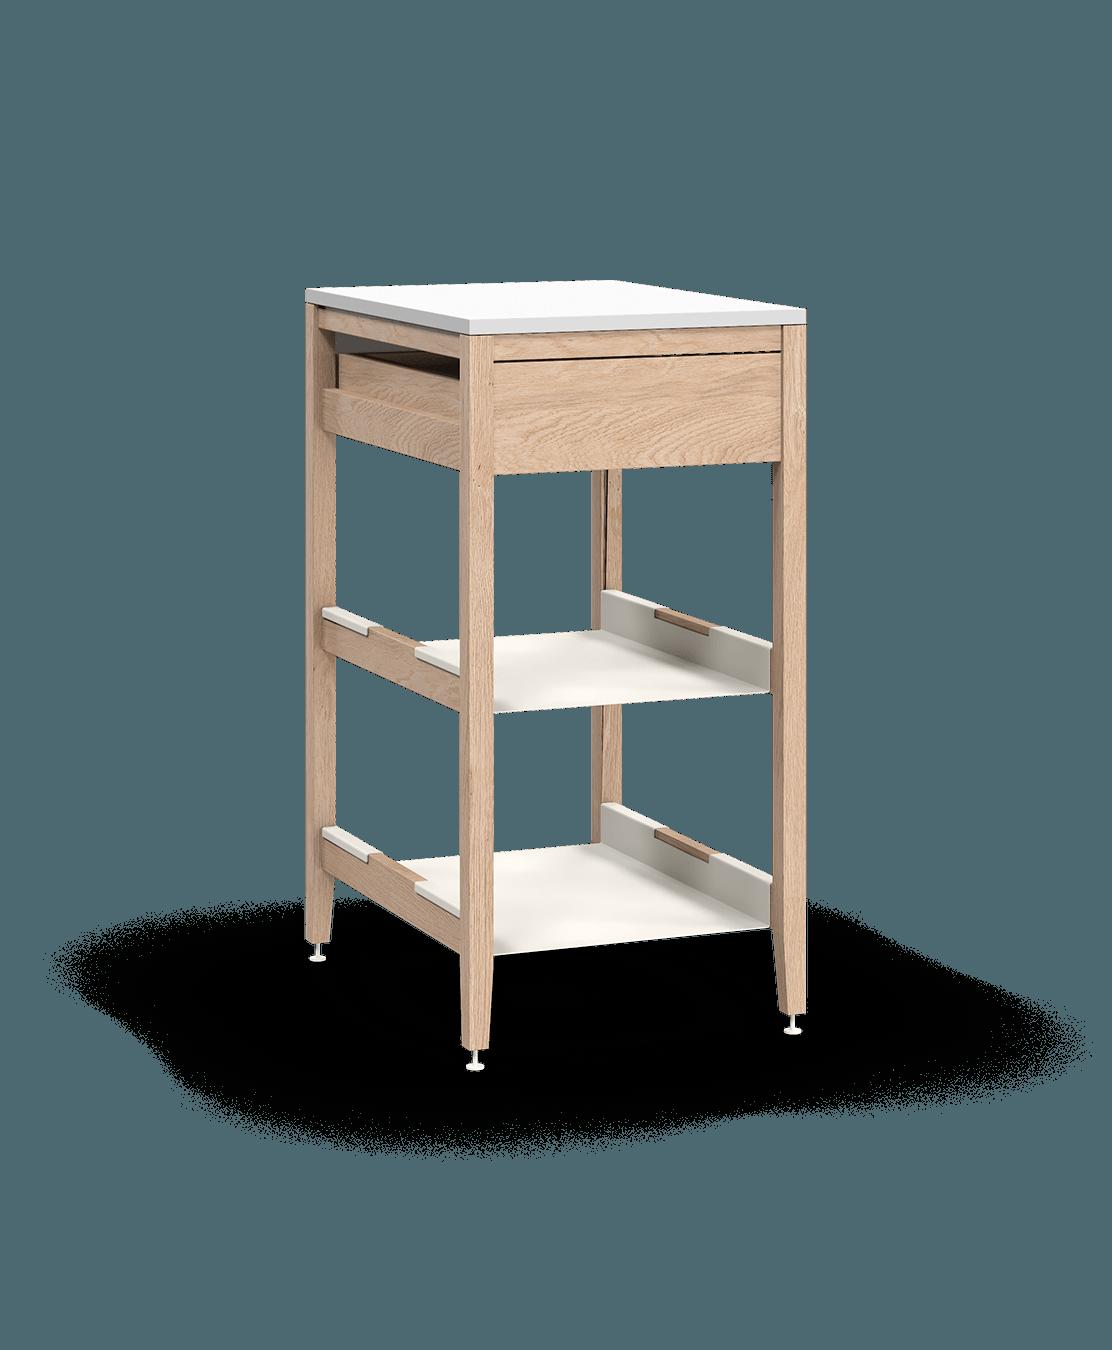 coquo radix white oak solid wood modular 2 shelves 1 drawer base kitchen cabinet 18 inch C1-C-18SB-1023-NA